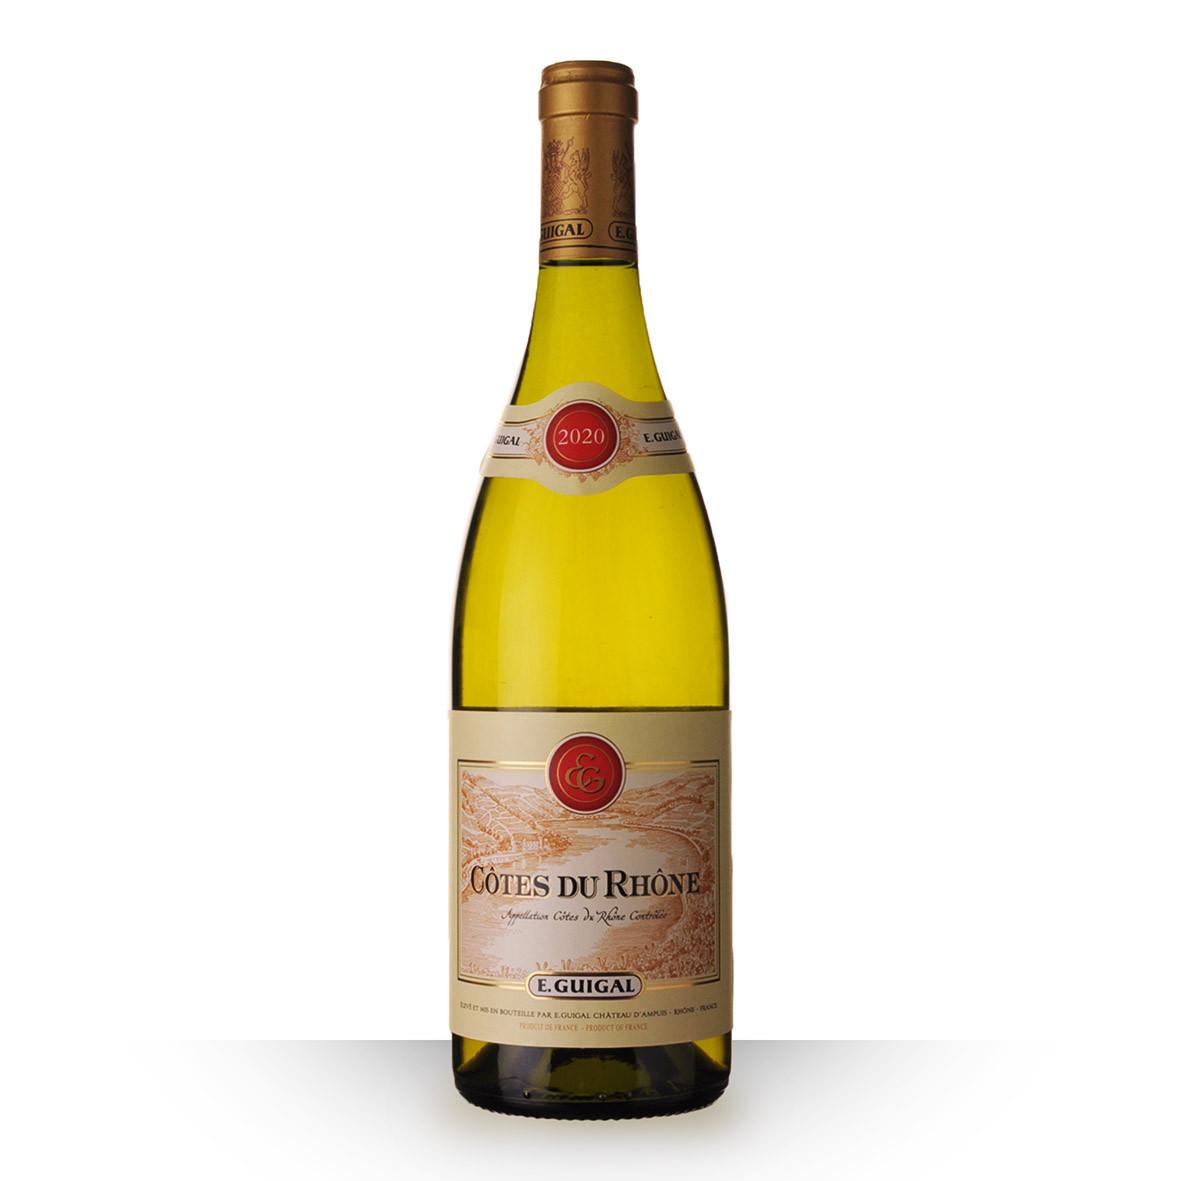 Guigal Côtes du Rhône Blanc 2020 75cl www.odyssee-vins.com